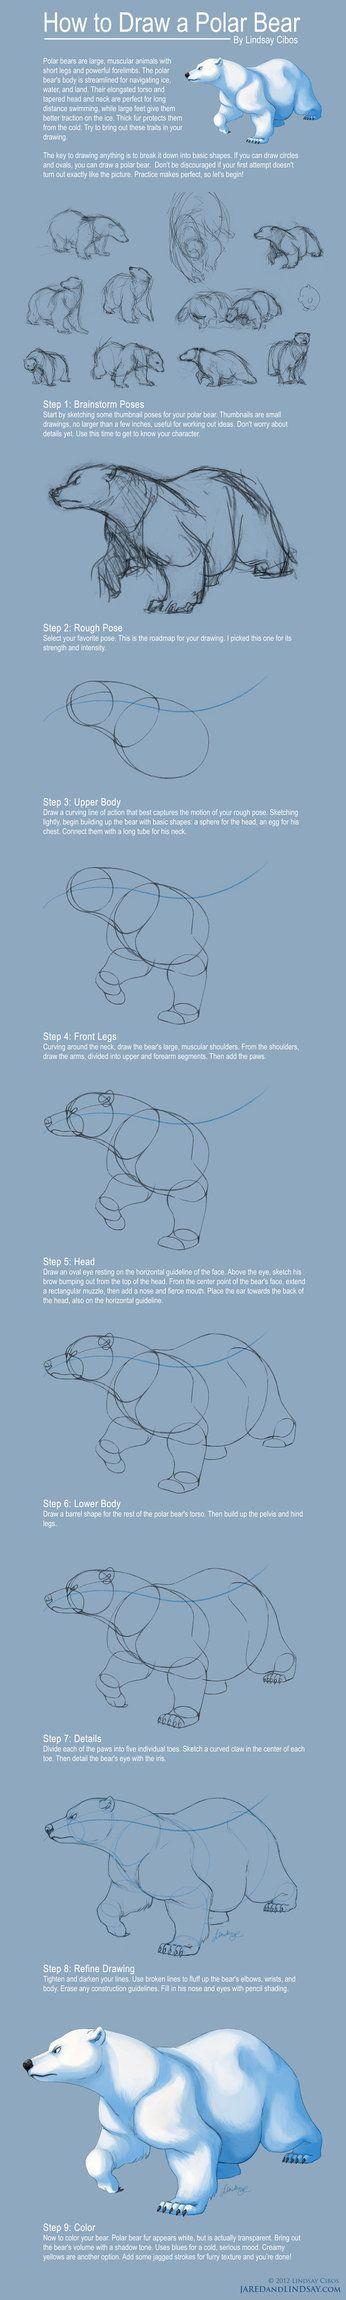 How to Draw a Polar Bear by ~LCibos on deviantART